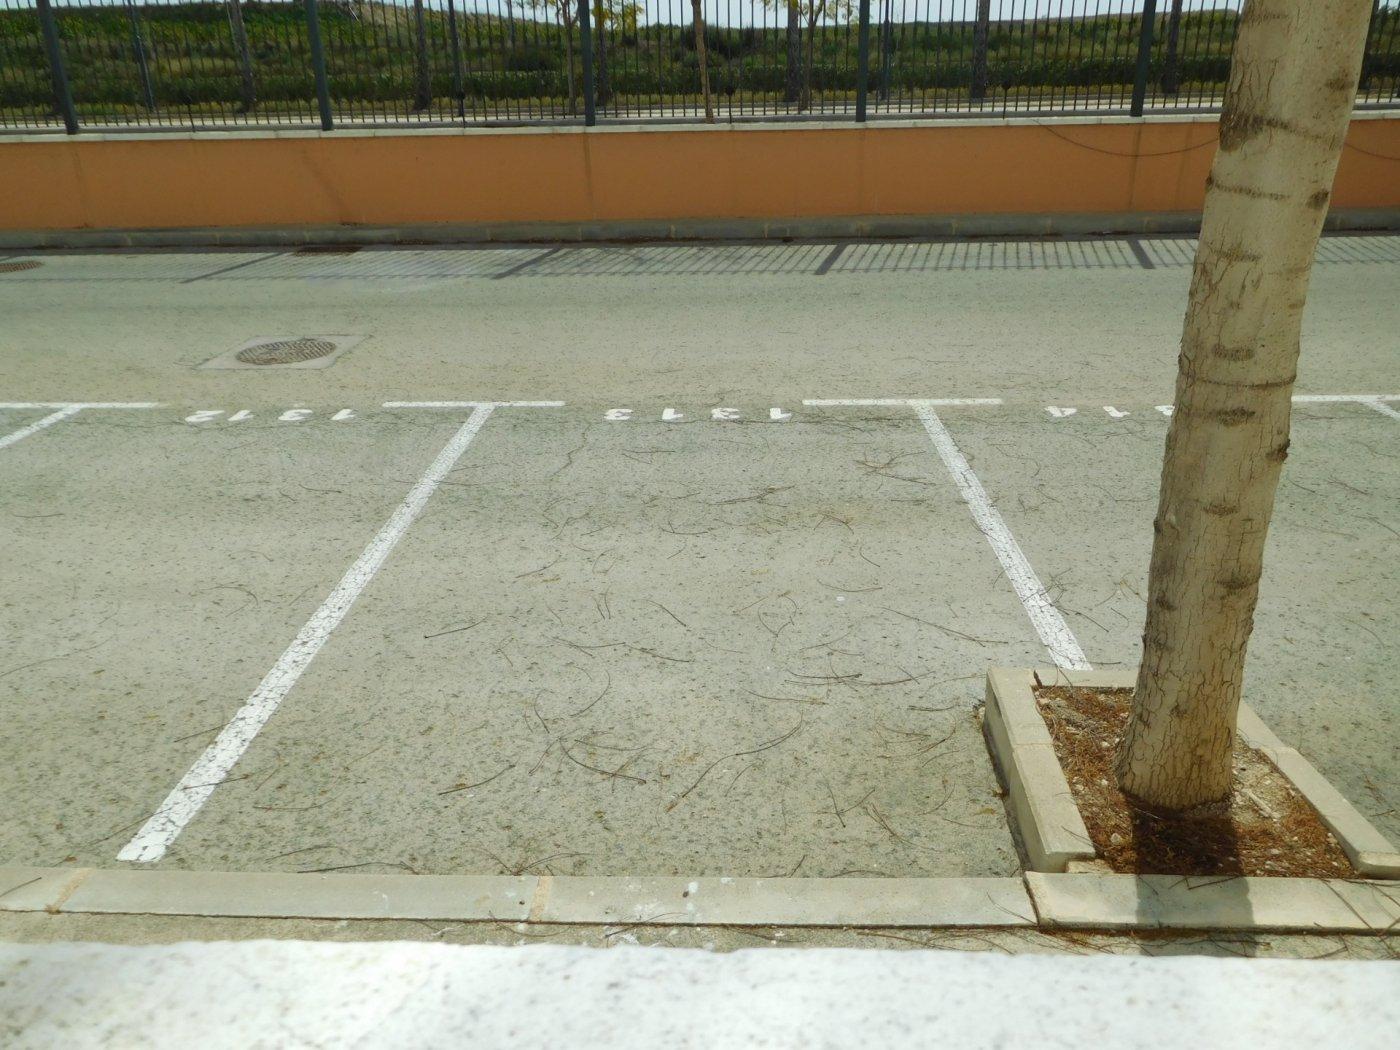 Gallery Image 19 of Apartment For rent in Condado De Alhama, Alhama De Murcia With Pool